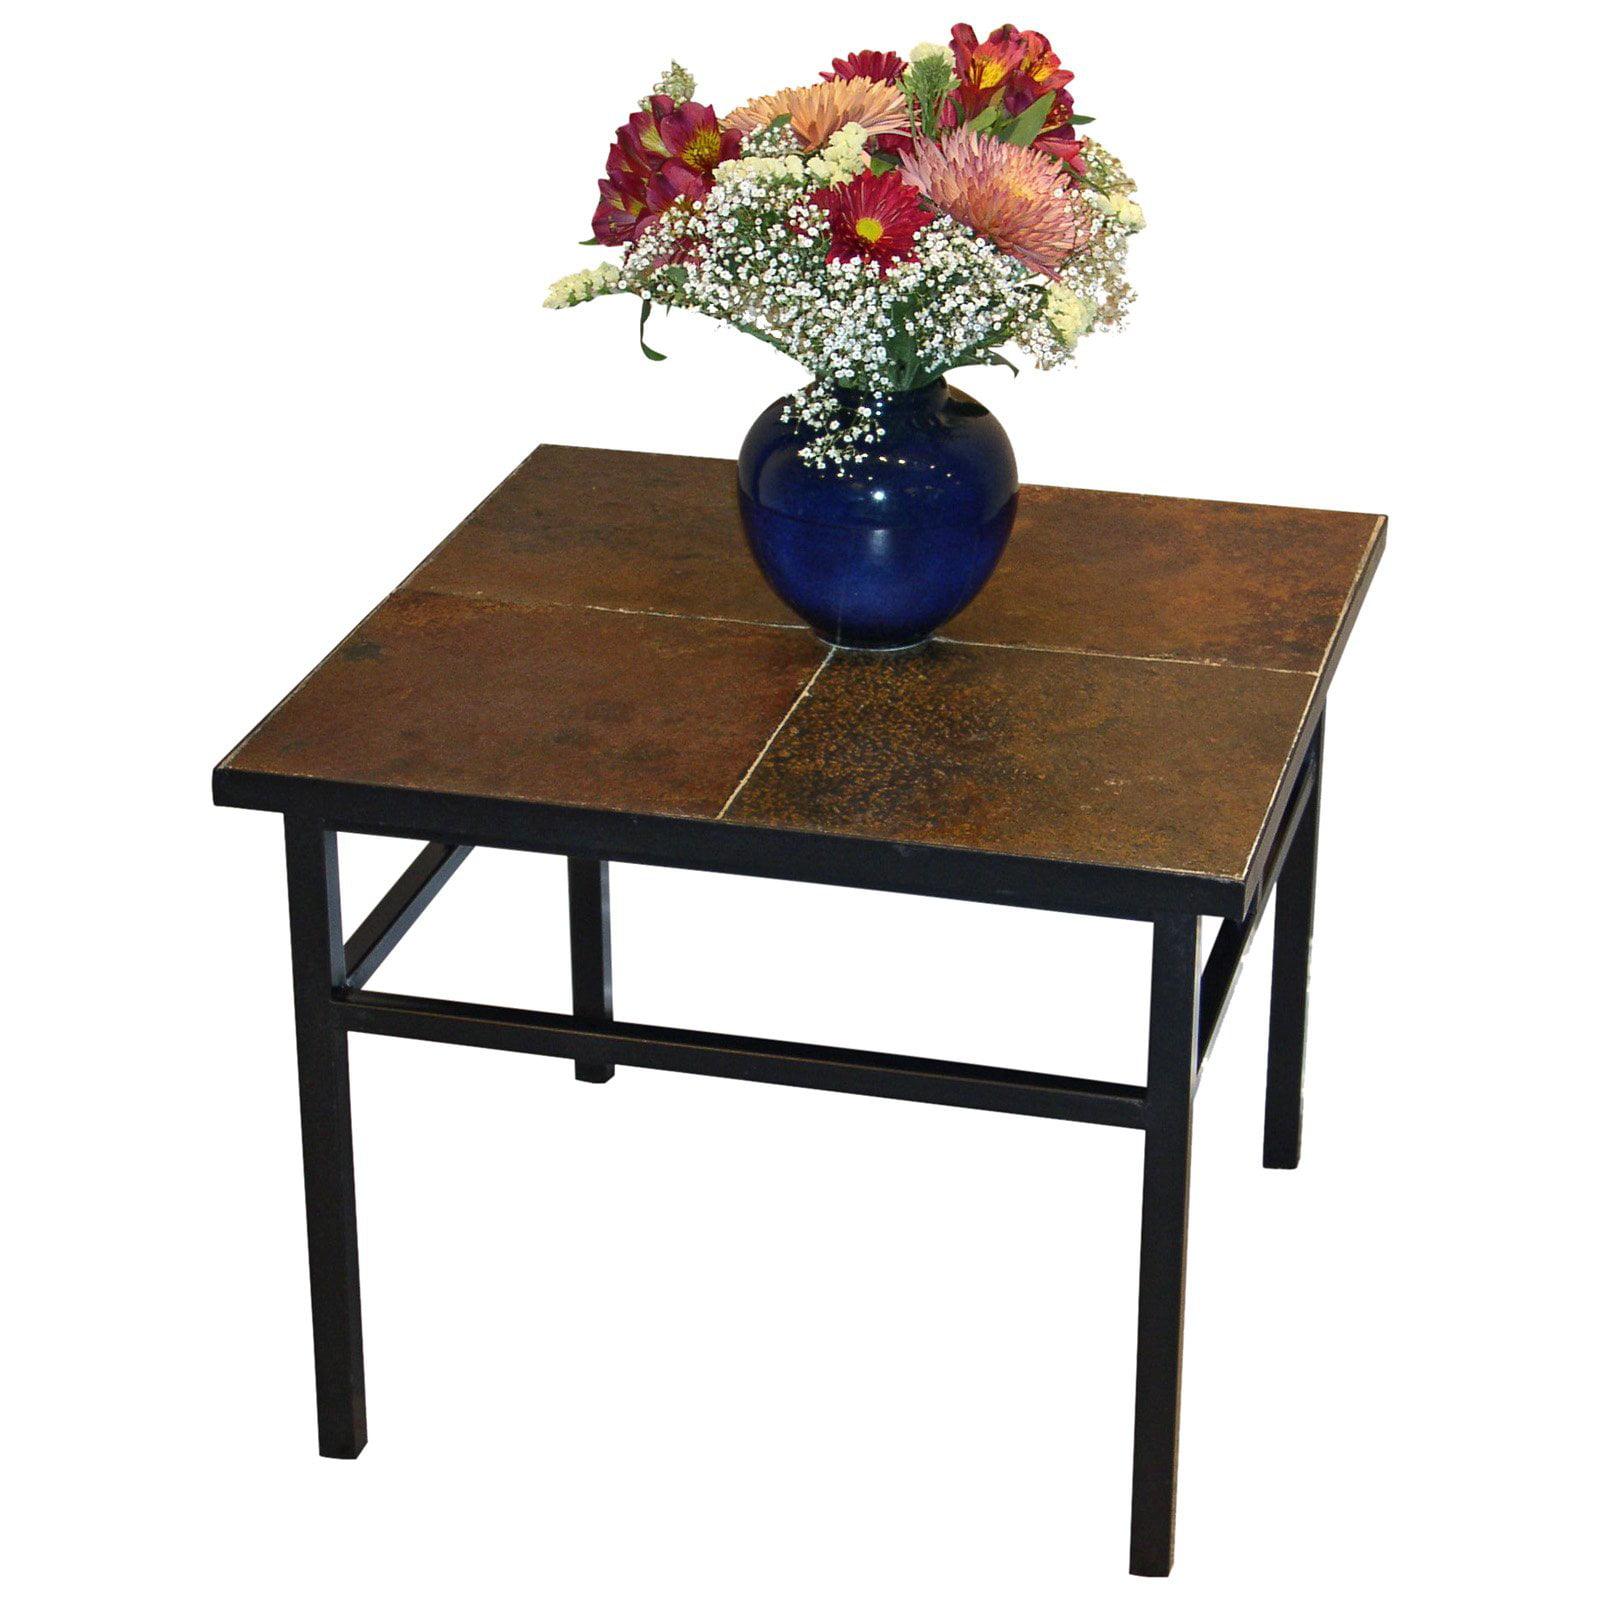 4D Concepts Slate End Table